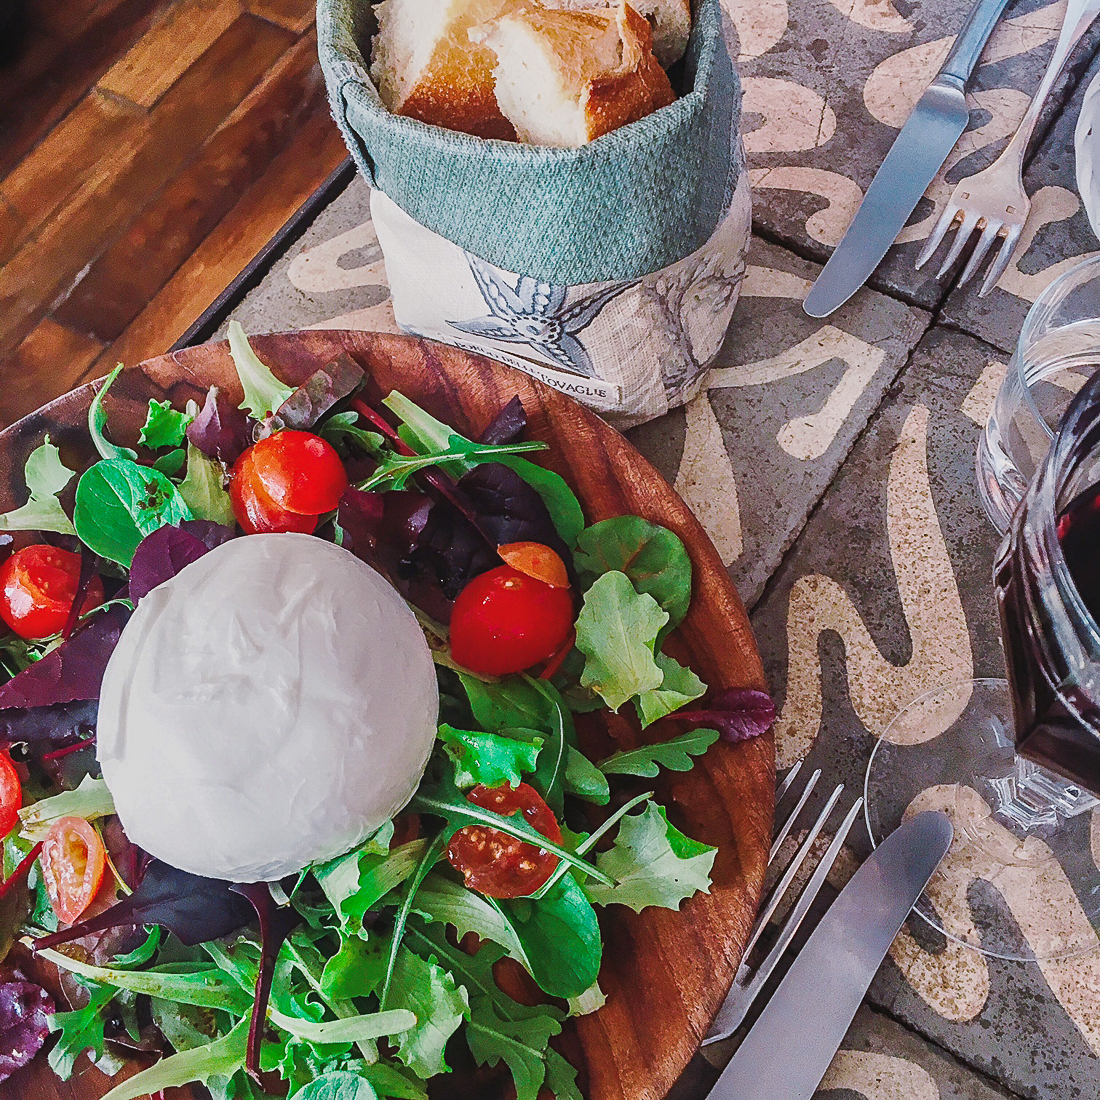 Borgo-delle-Tovaglie-paris11-restaurant